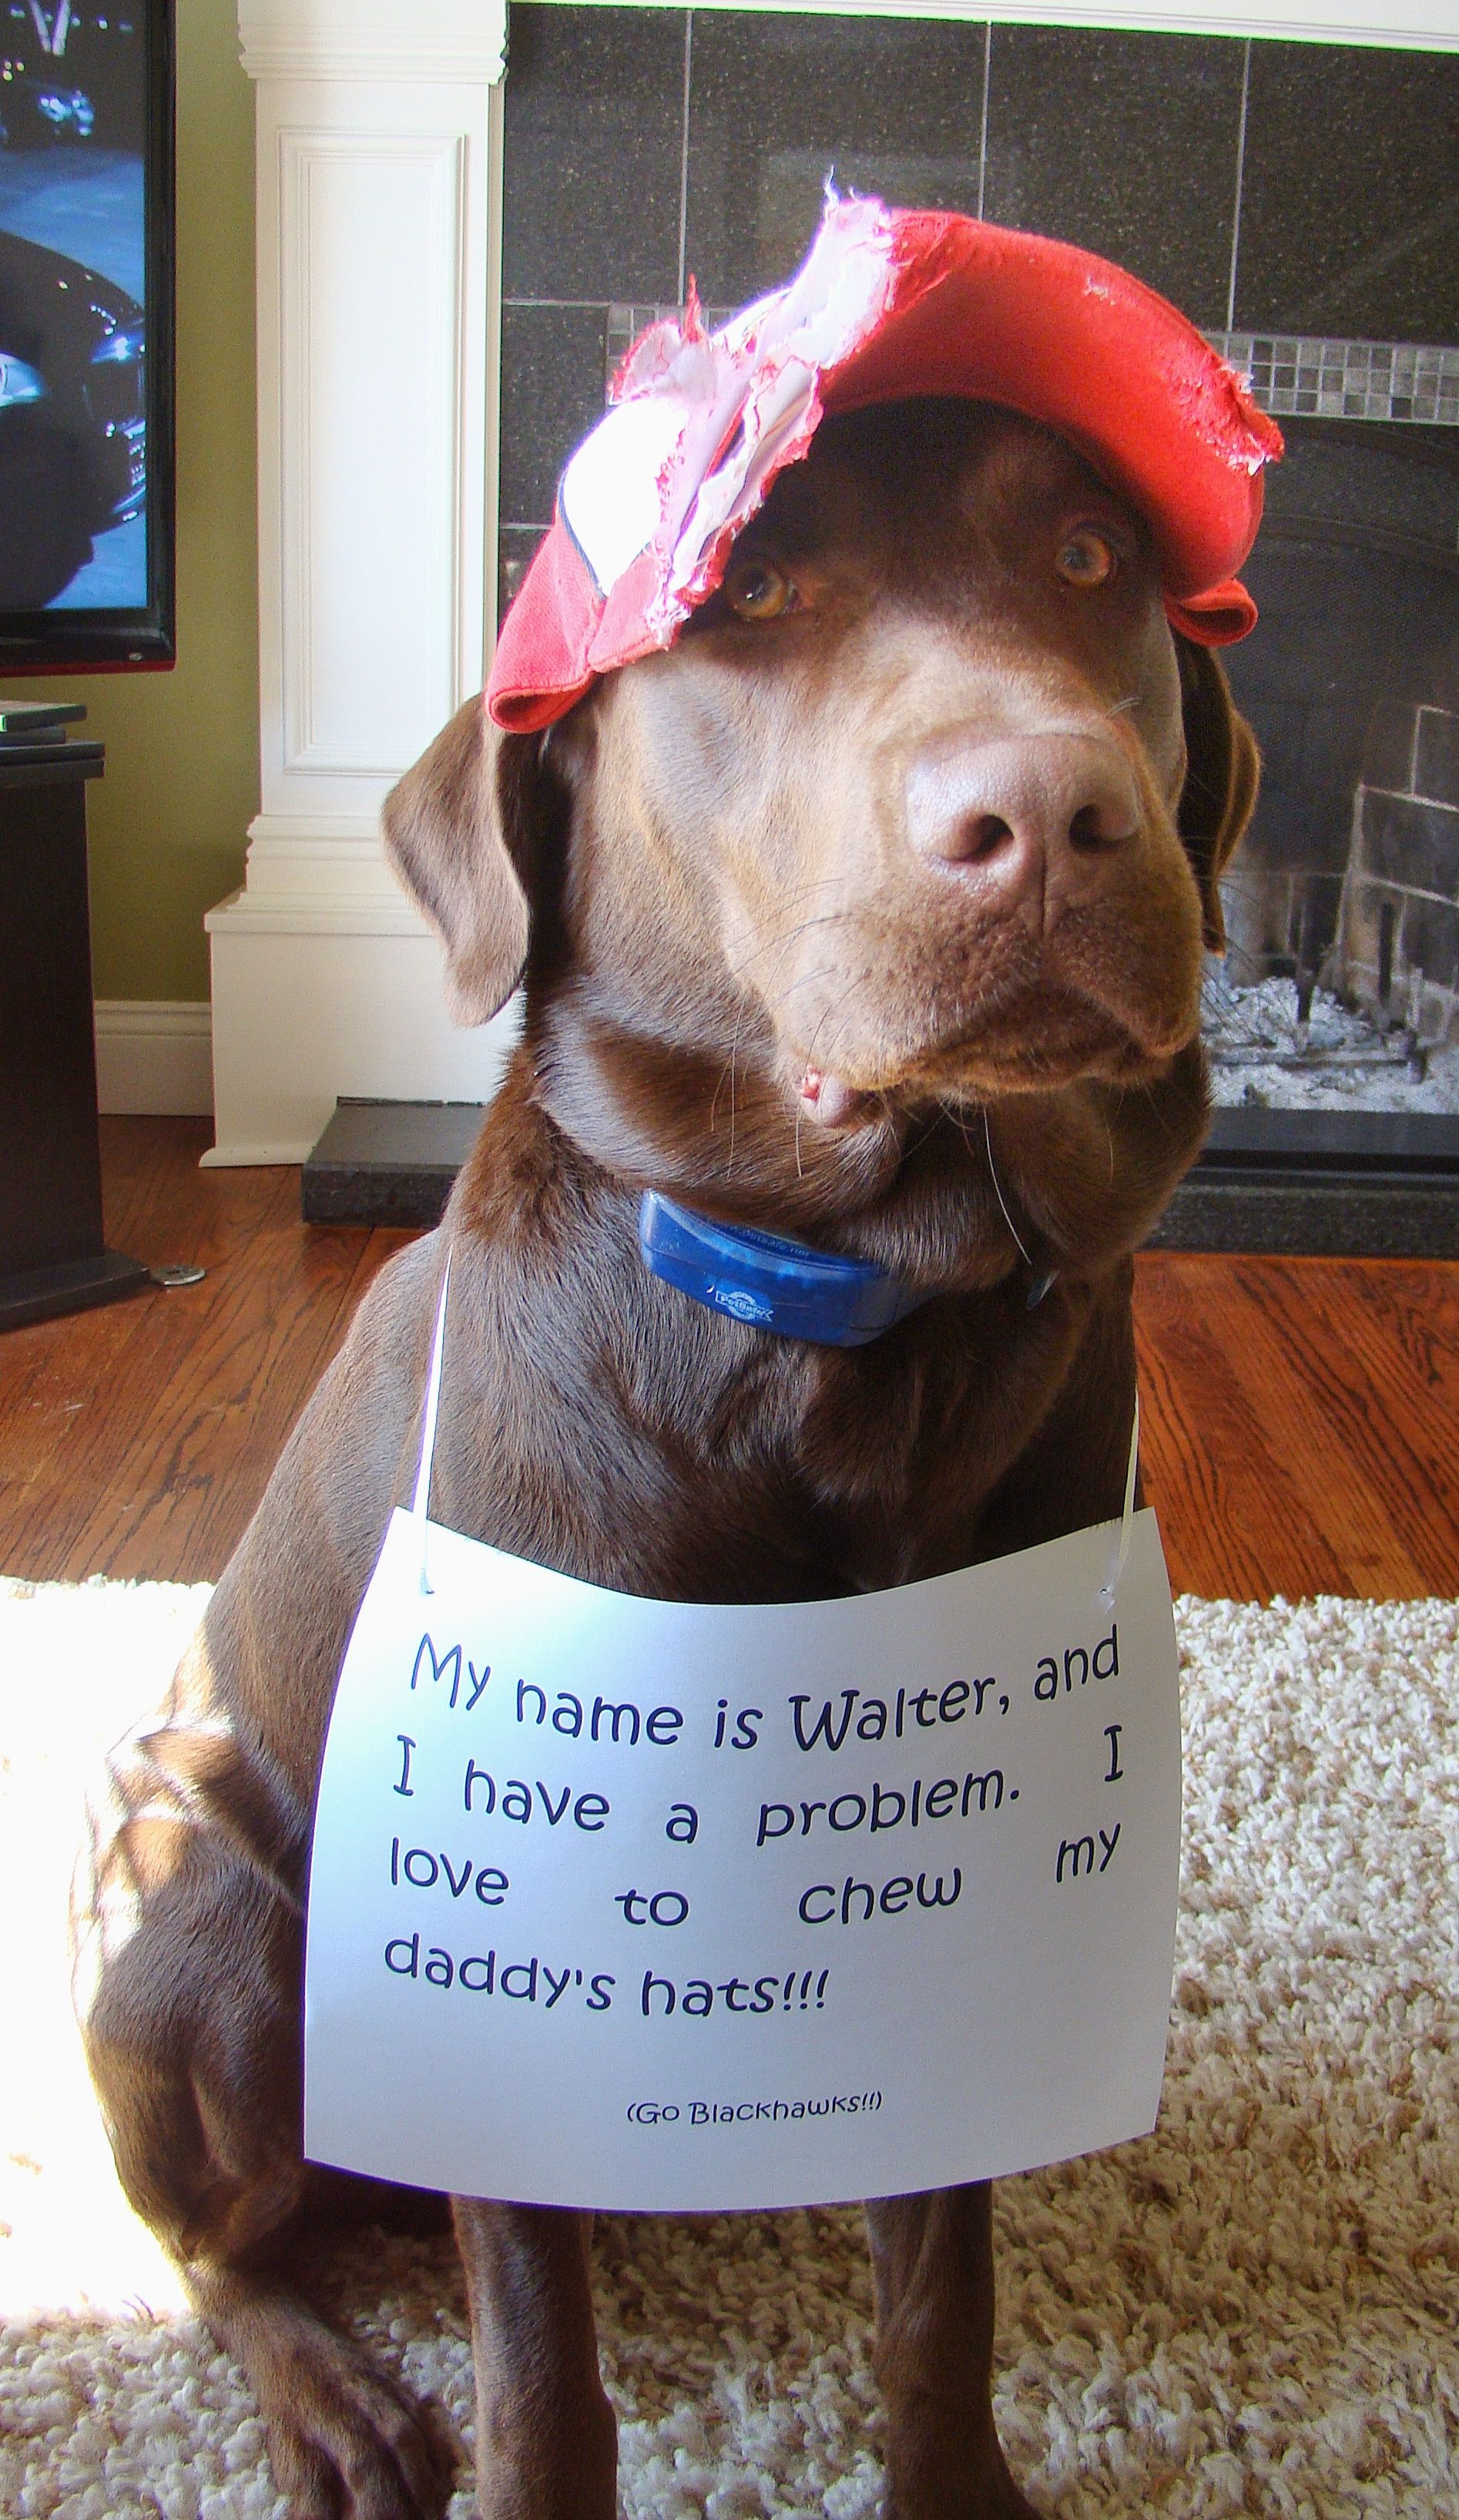 Walter eats Hat Dog shaming, Dog shaming funny, Animal